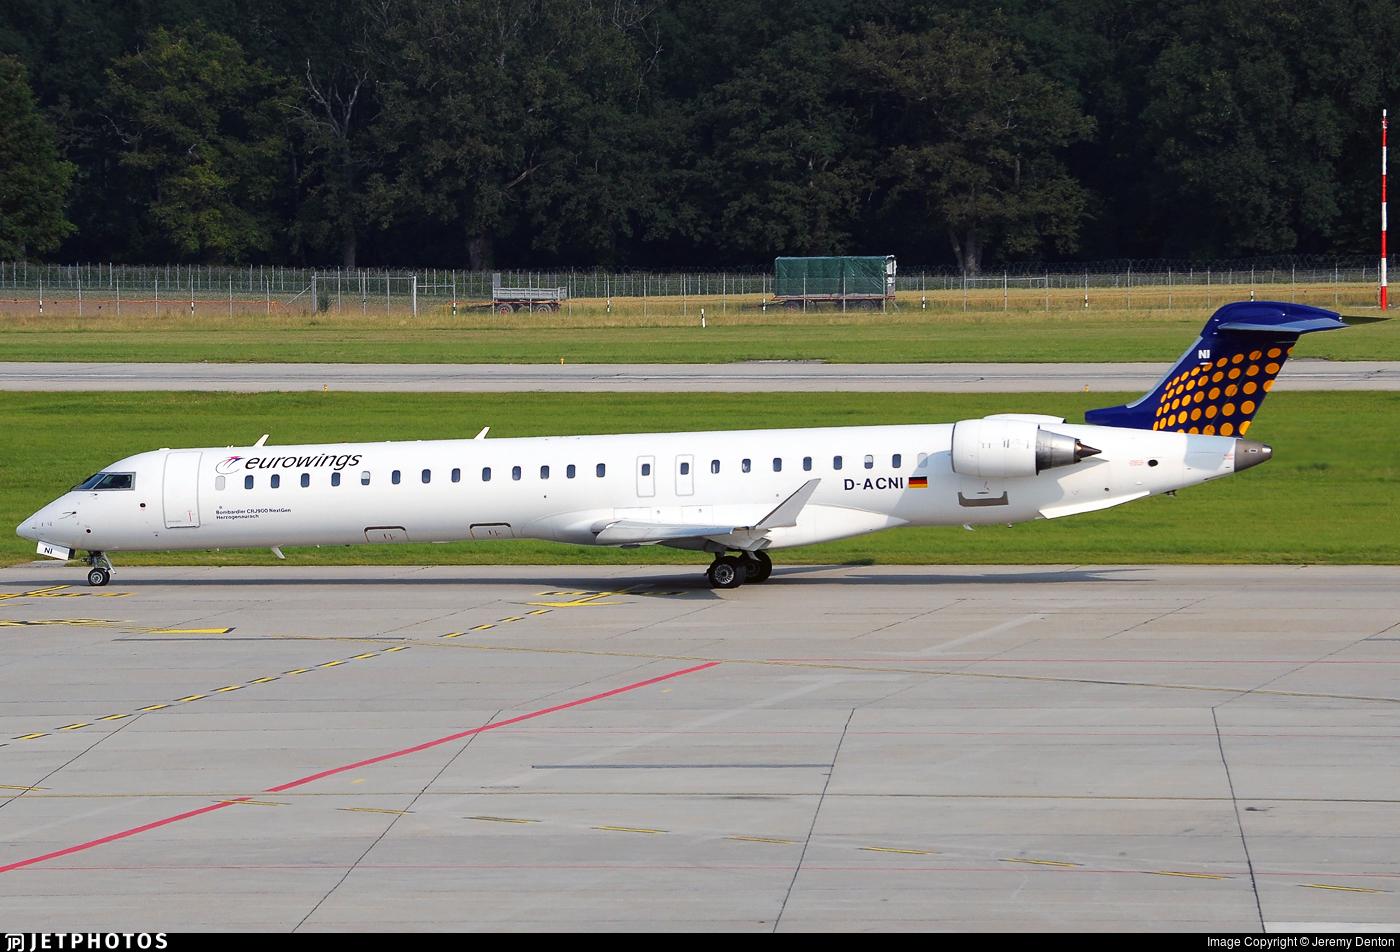 D-ACNI - Bombardier CRJ-900LR - Eurowings